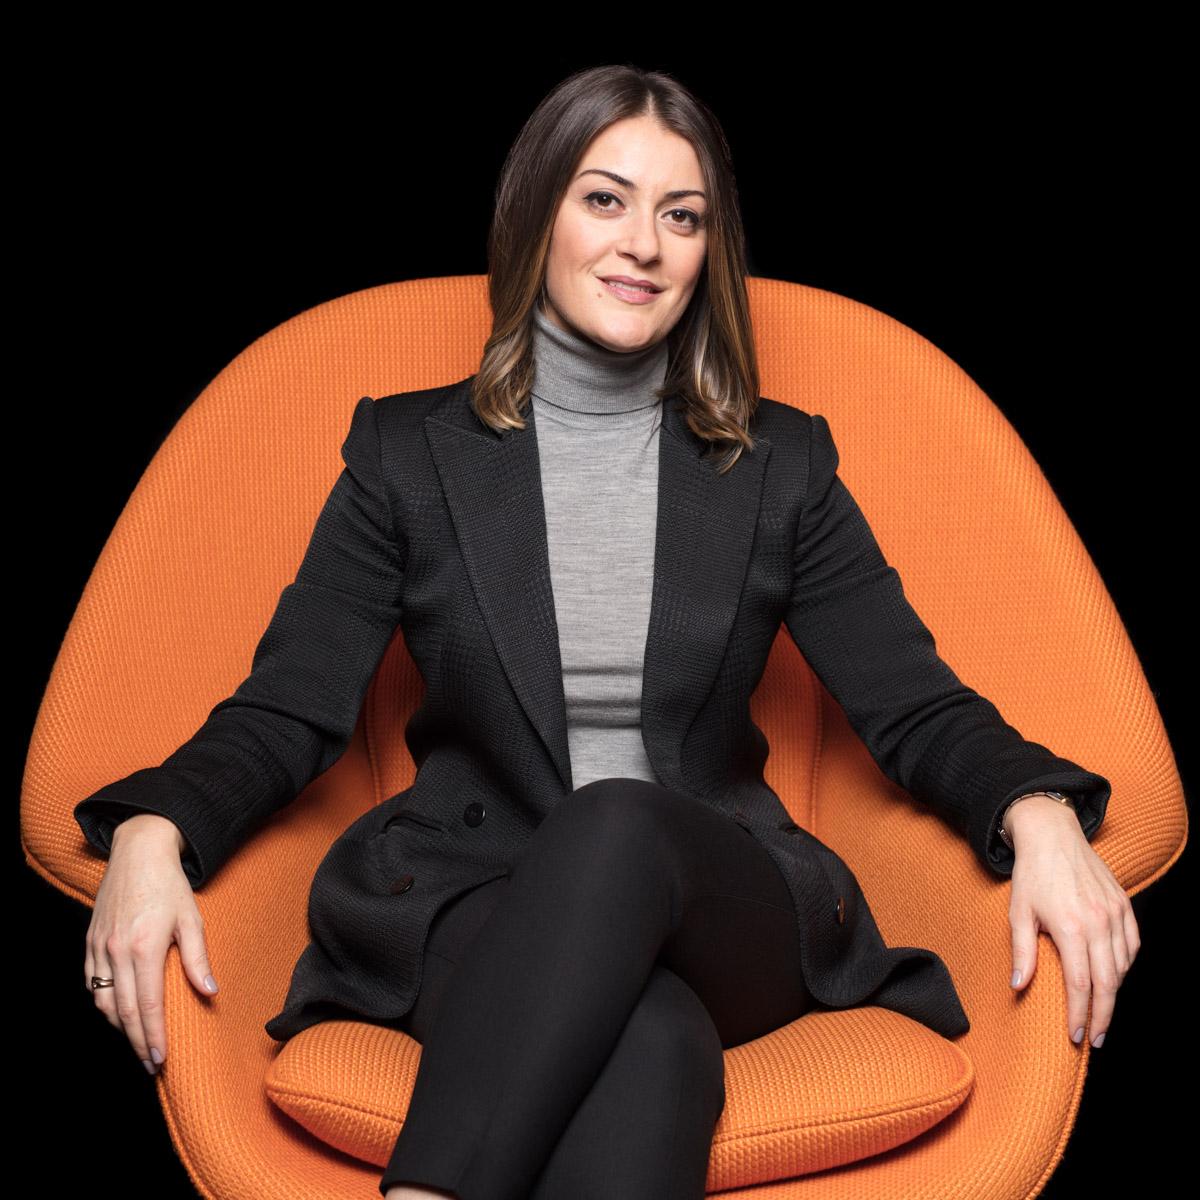 Modern, editorial portraits for NYC lawyers pretty lawyer in stylish orange chair